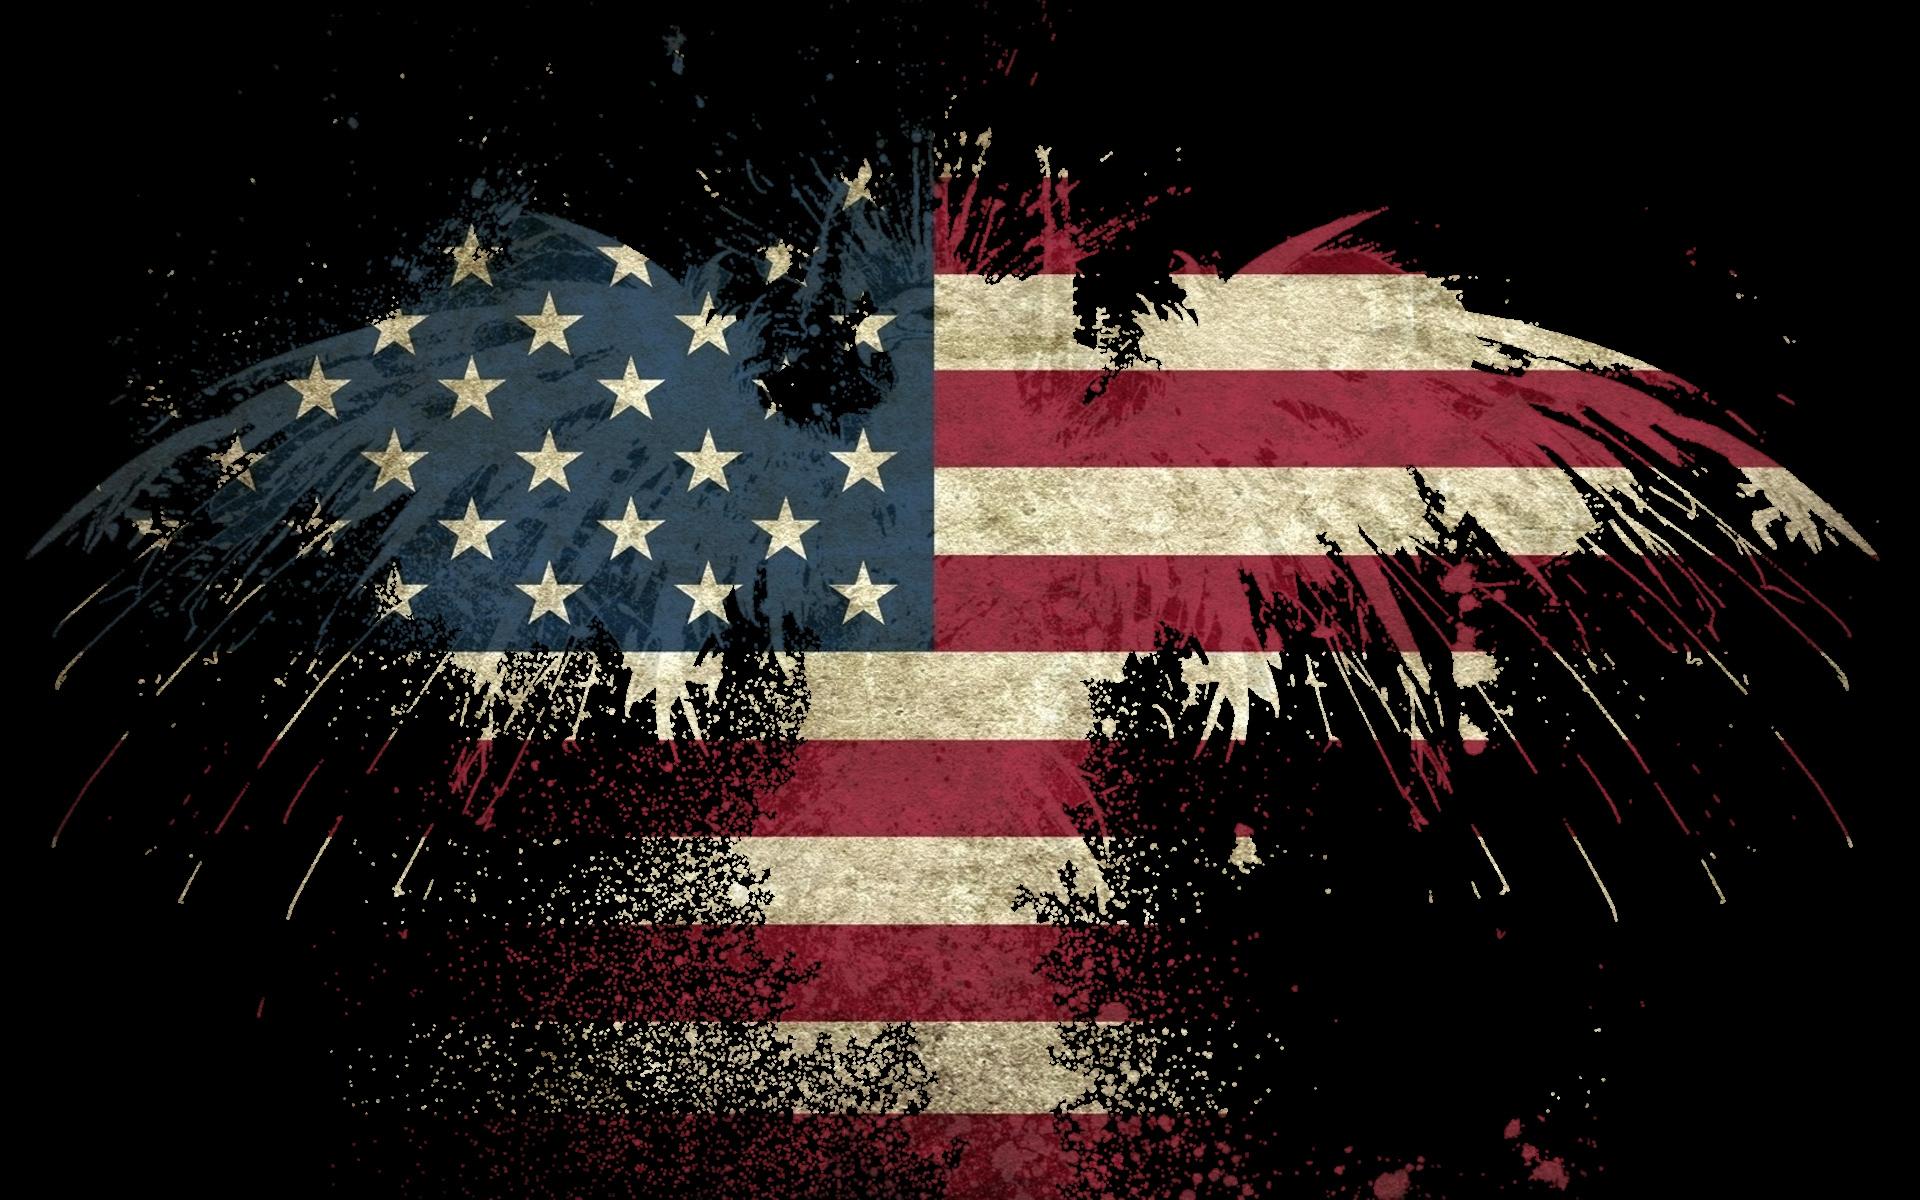 USA America flag eagle wallpaper background 1920x1200